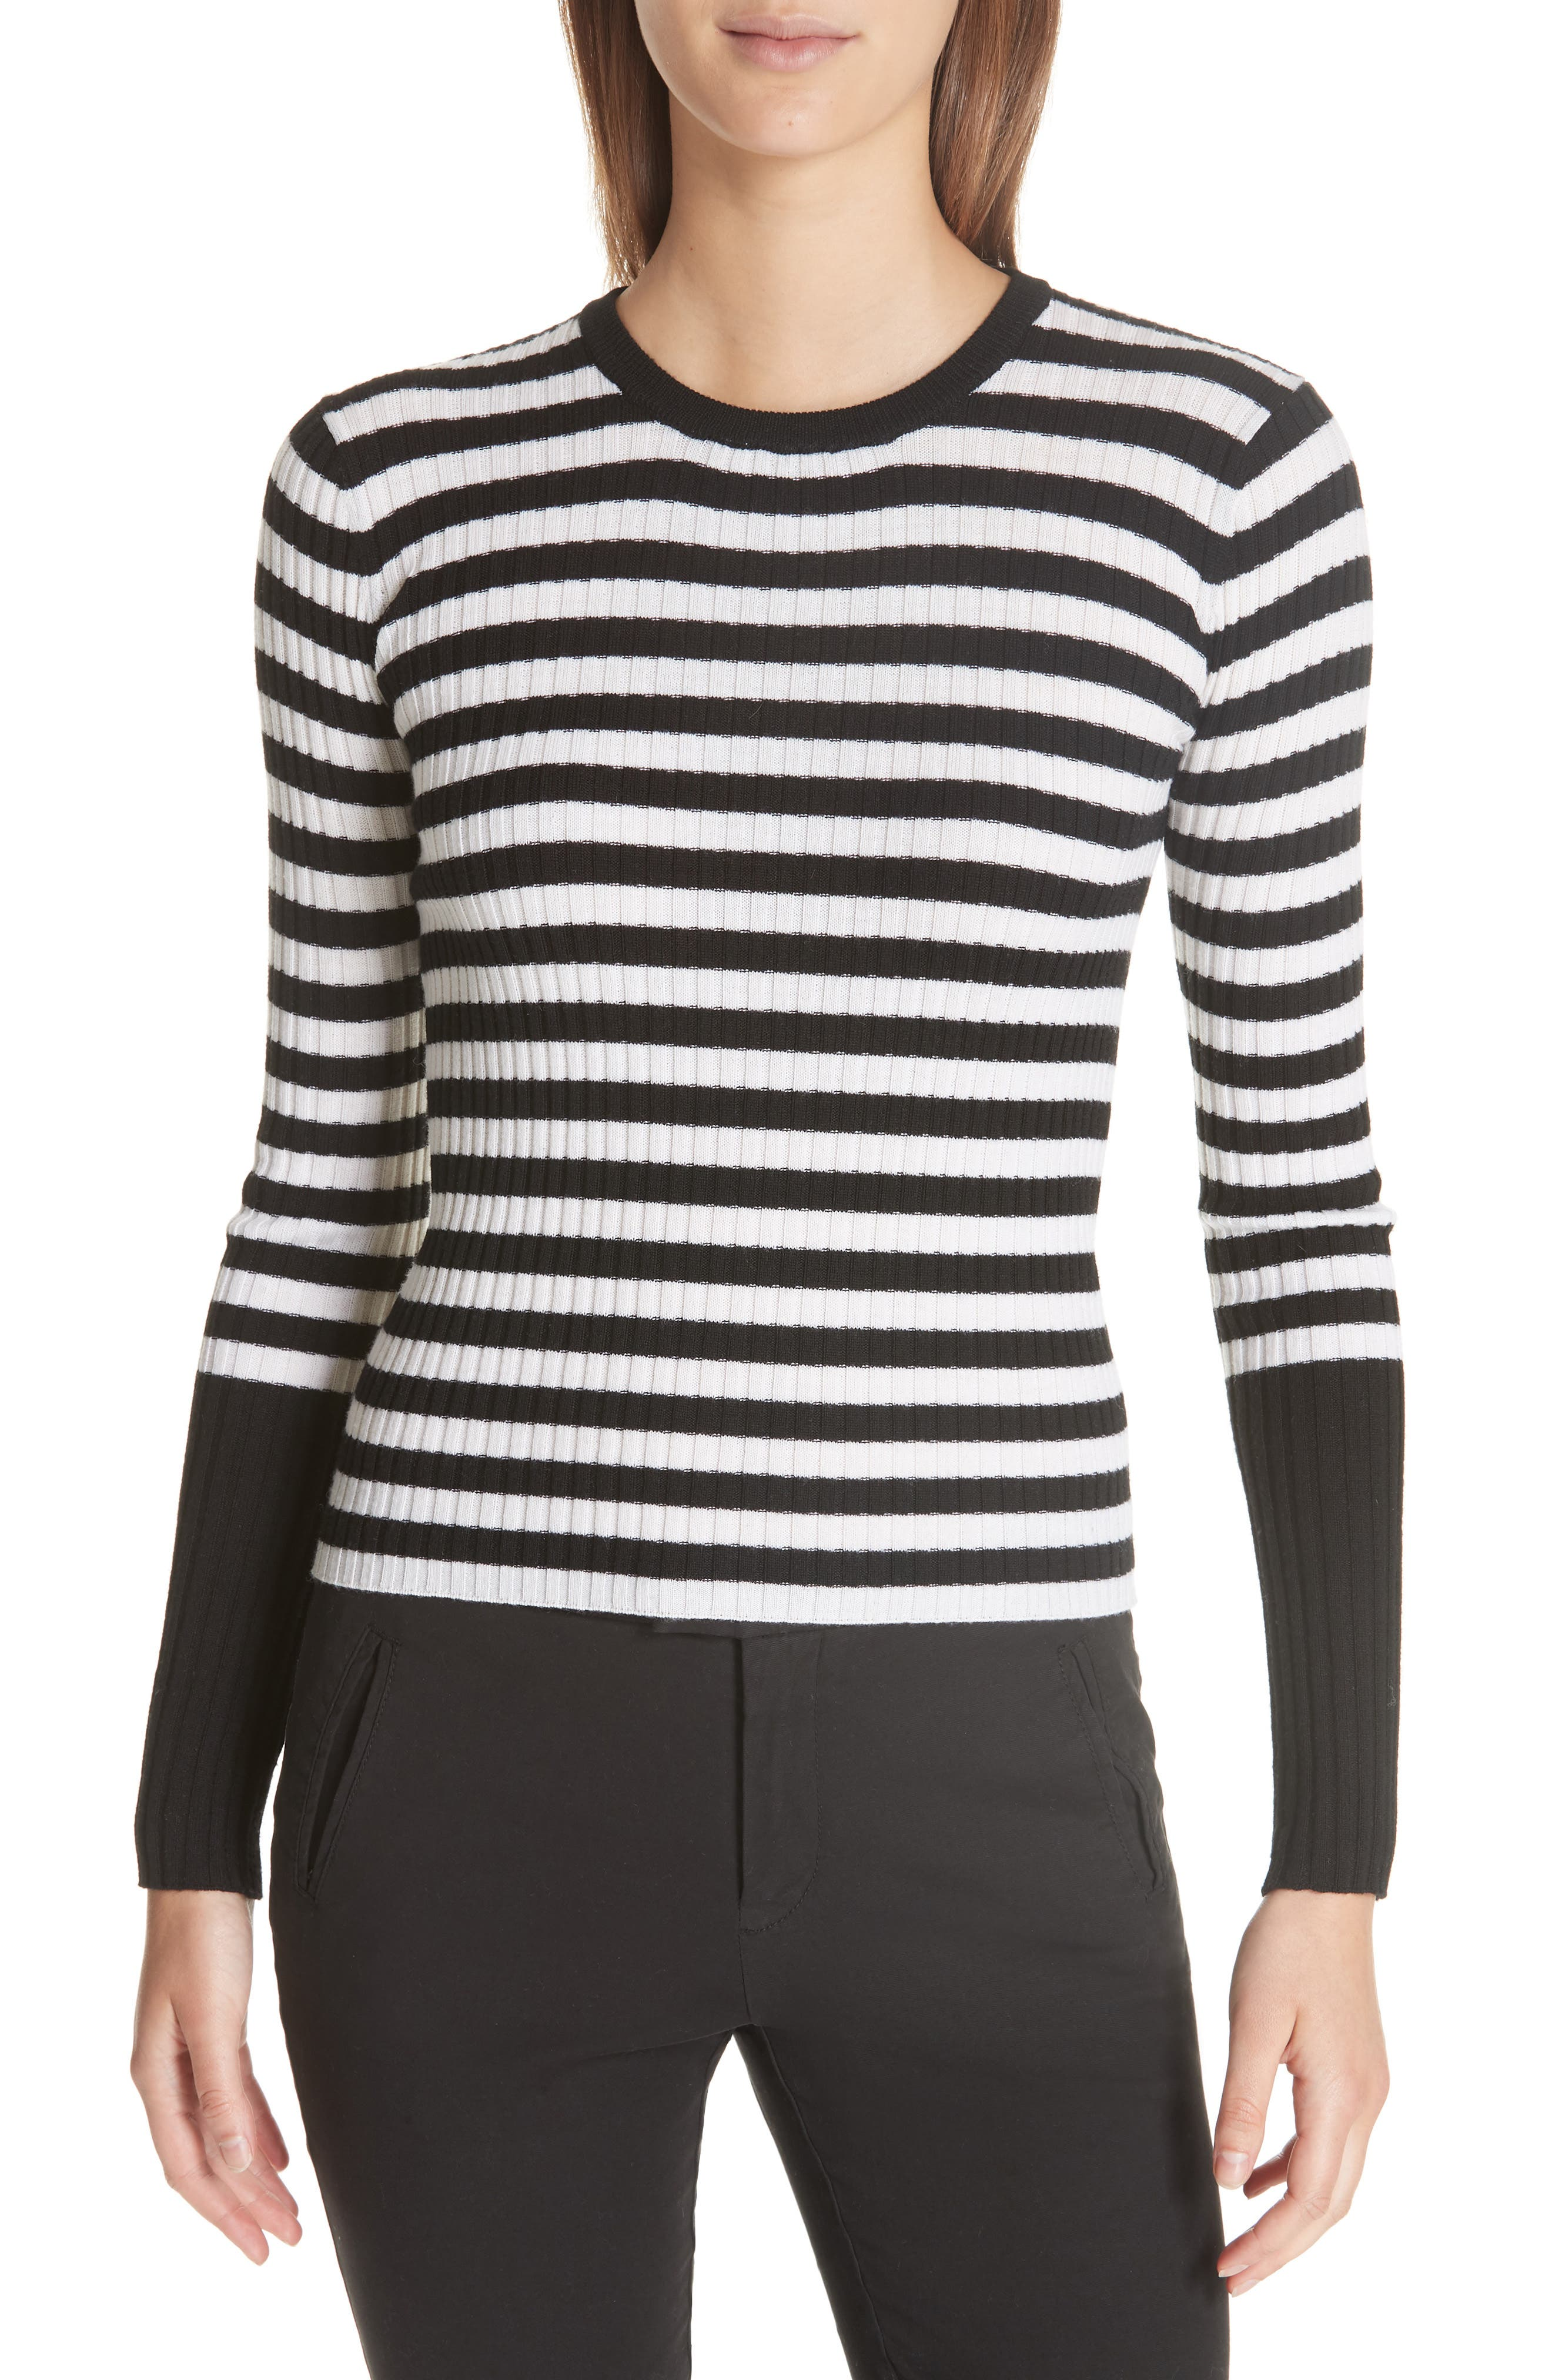 Atm Anthony Thomas Melillo Stripe Rib Merino Wool Sweater, Black